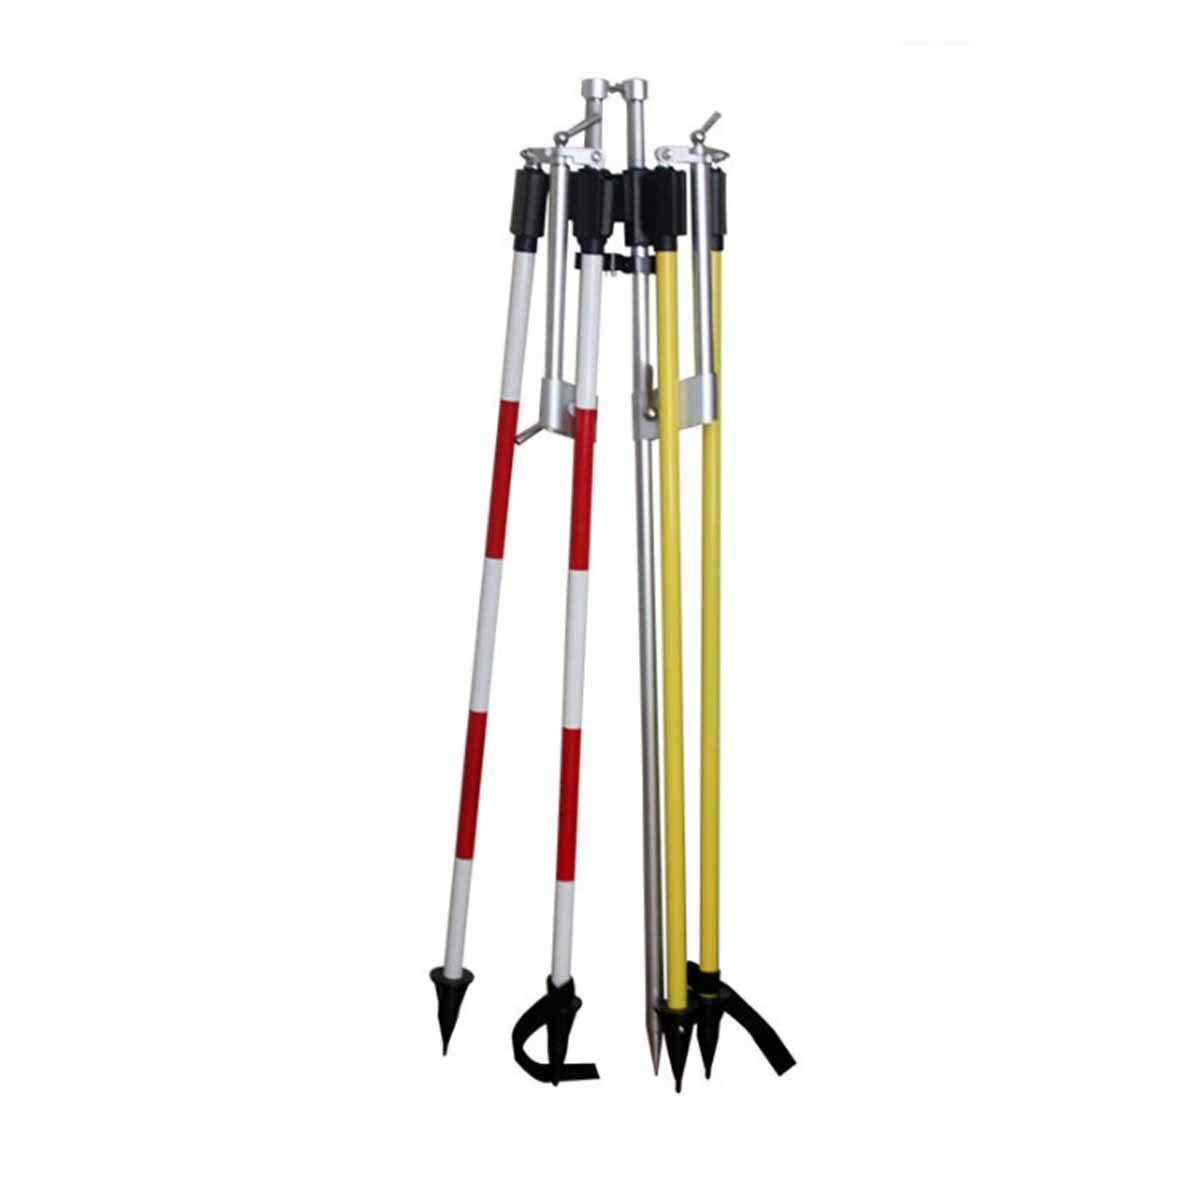 2.15 M Centering Rod With Bracket, Prism Tripod, Prism Rod (Size : 2.15M)